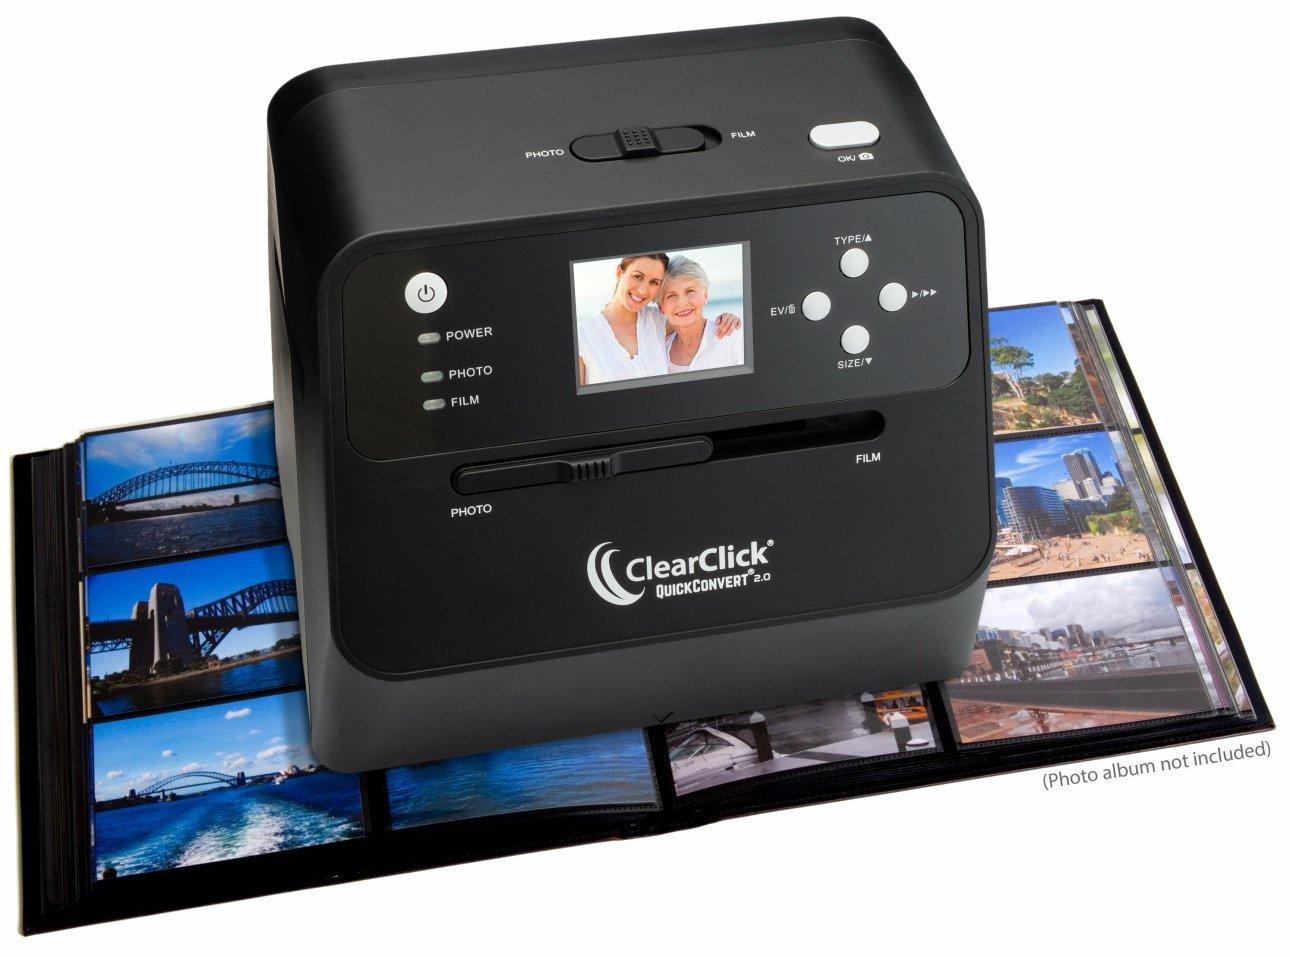 ClearClick QuickConvert 2.0 сканирование фотокниги